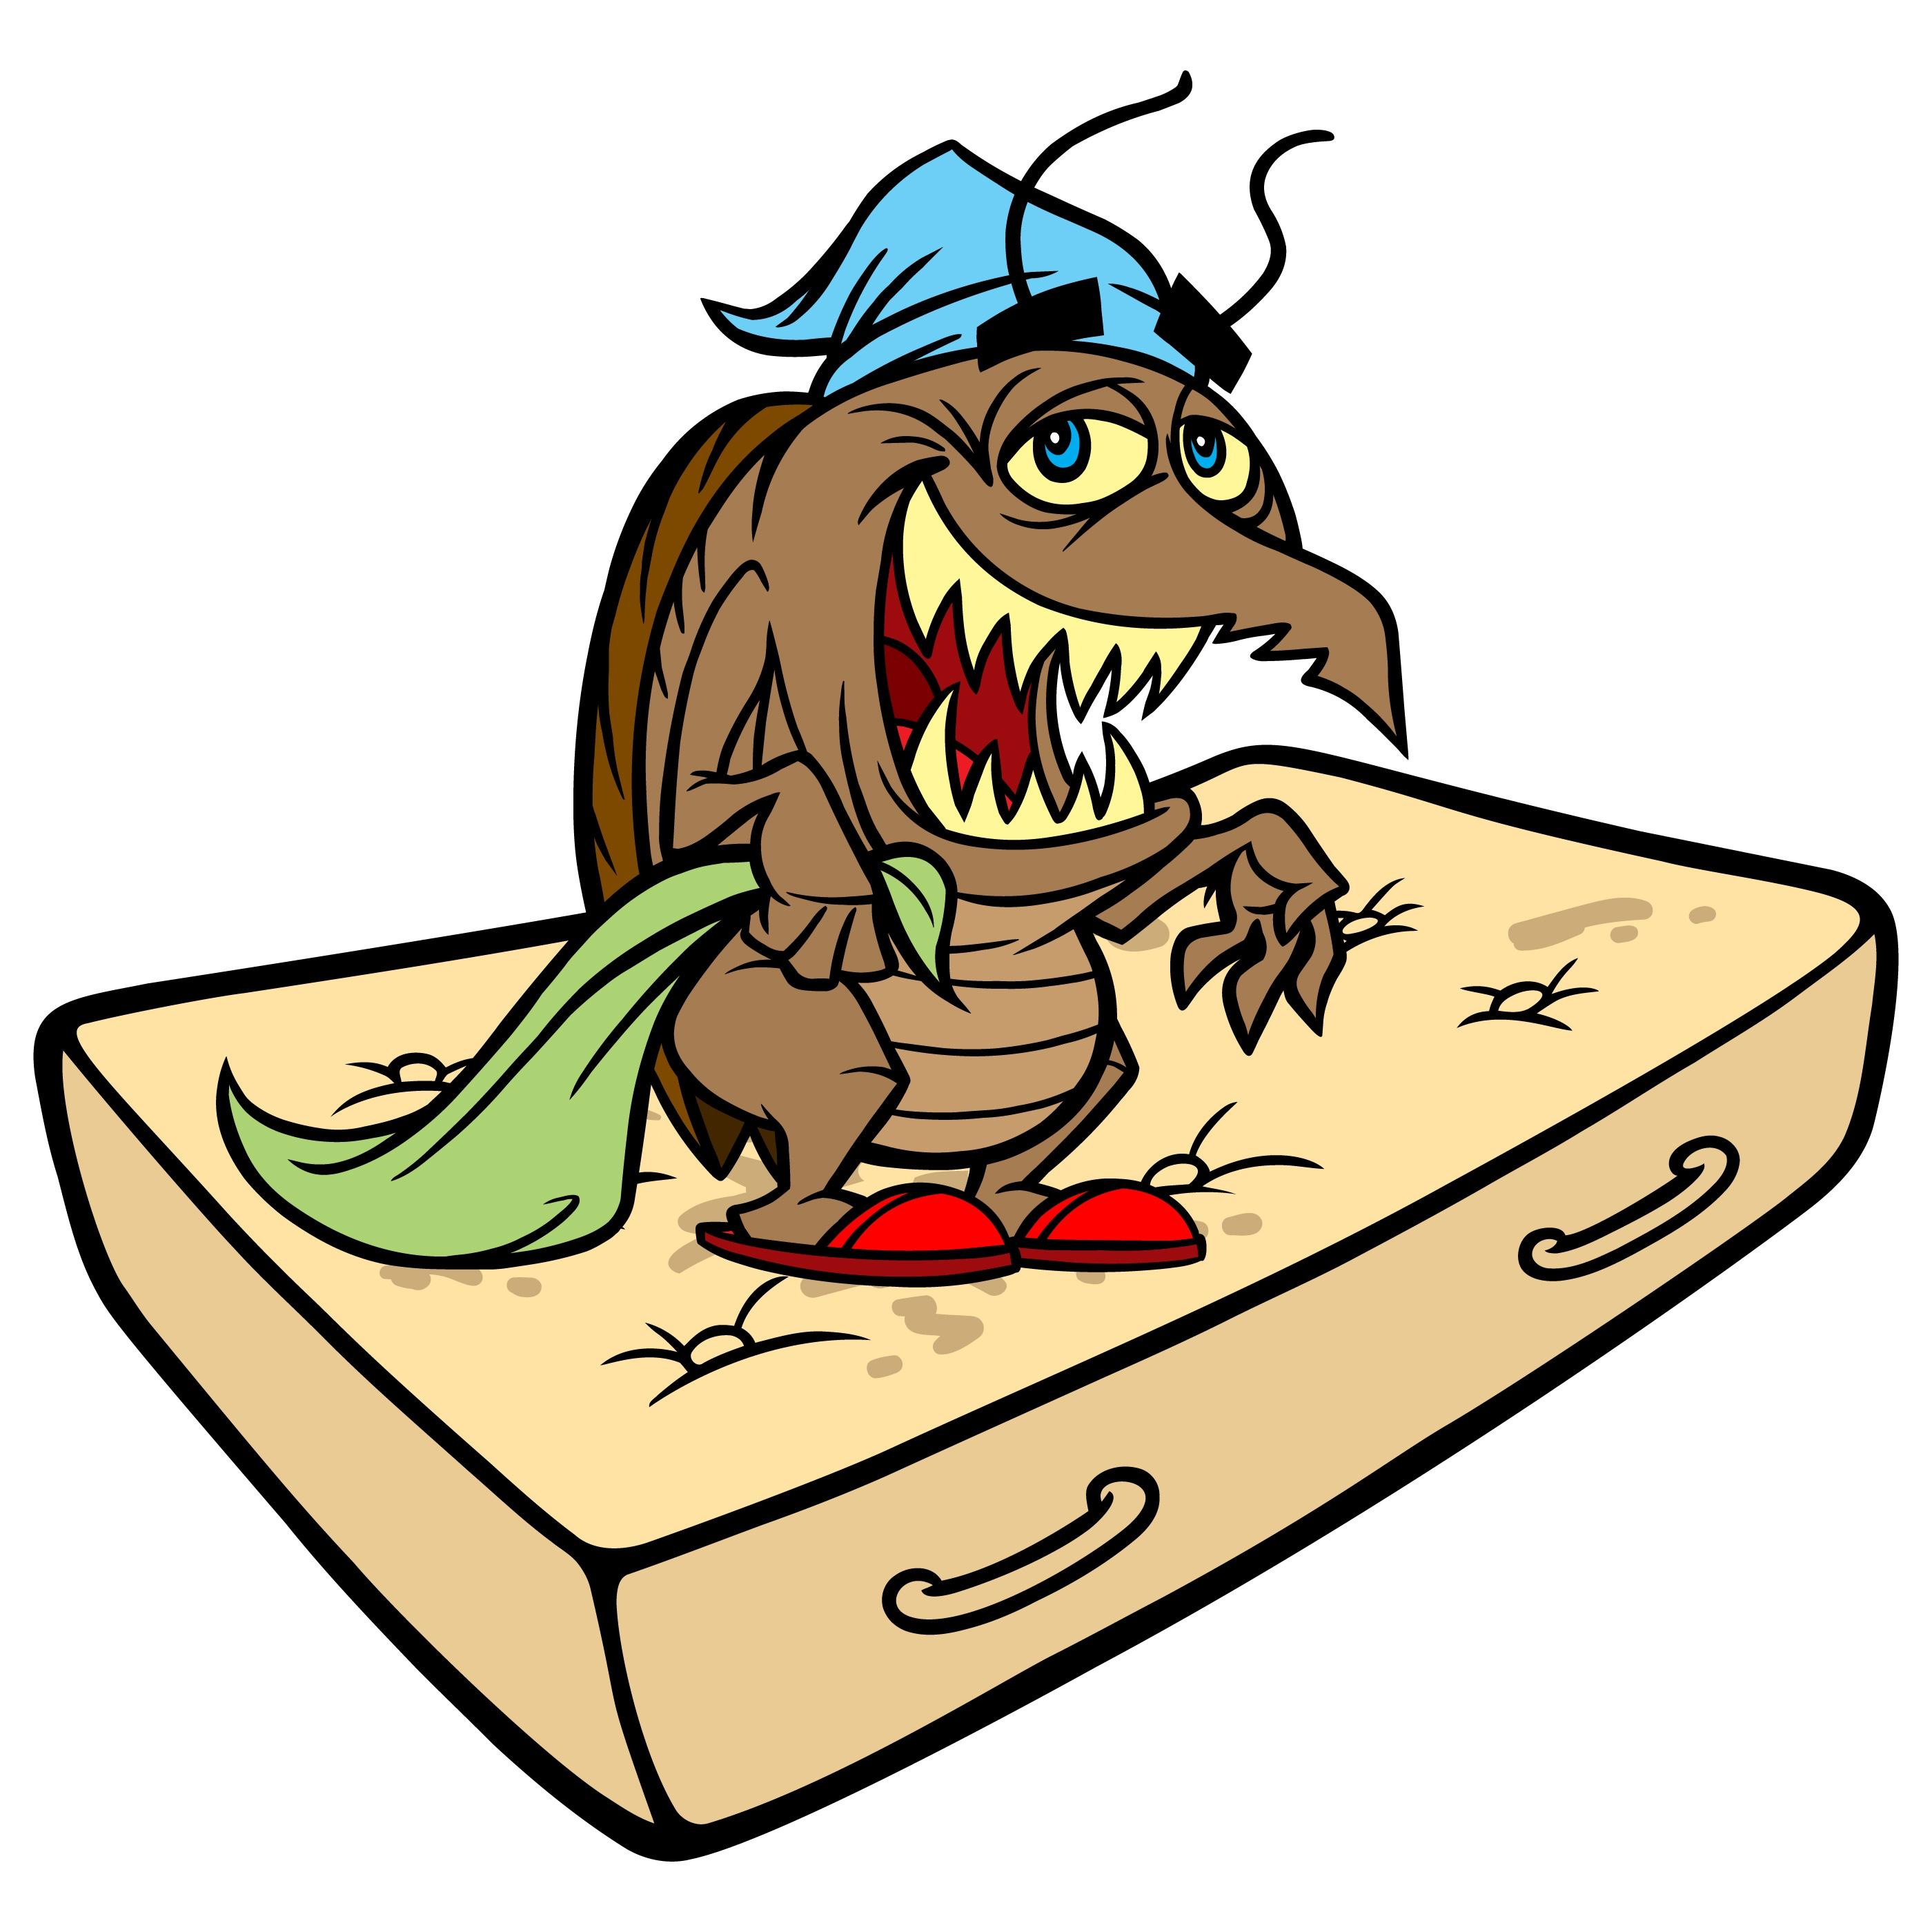 Cartoon picture of a bedbug on a mattress.